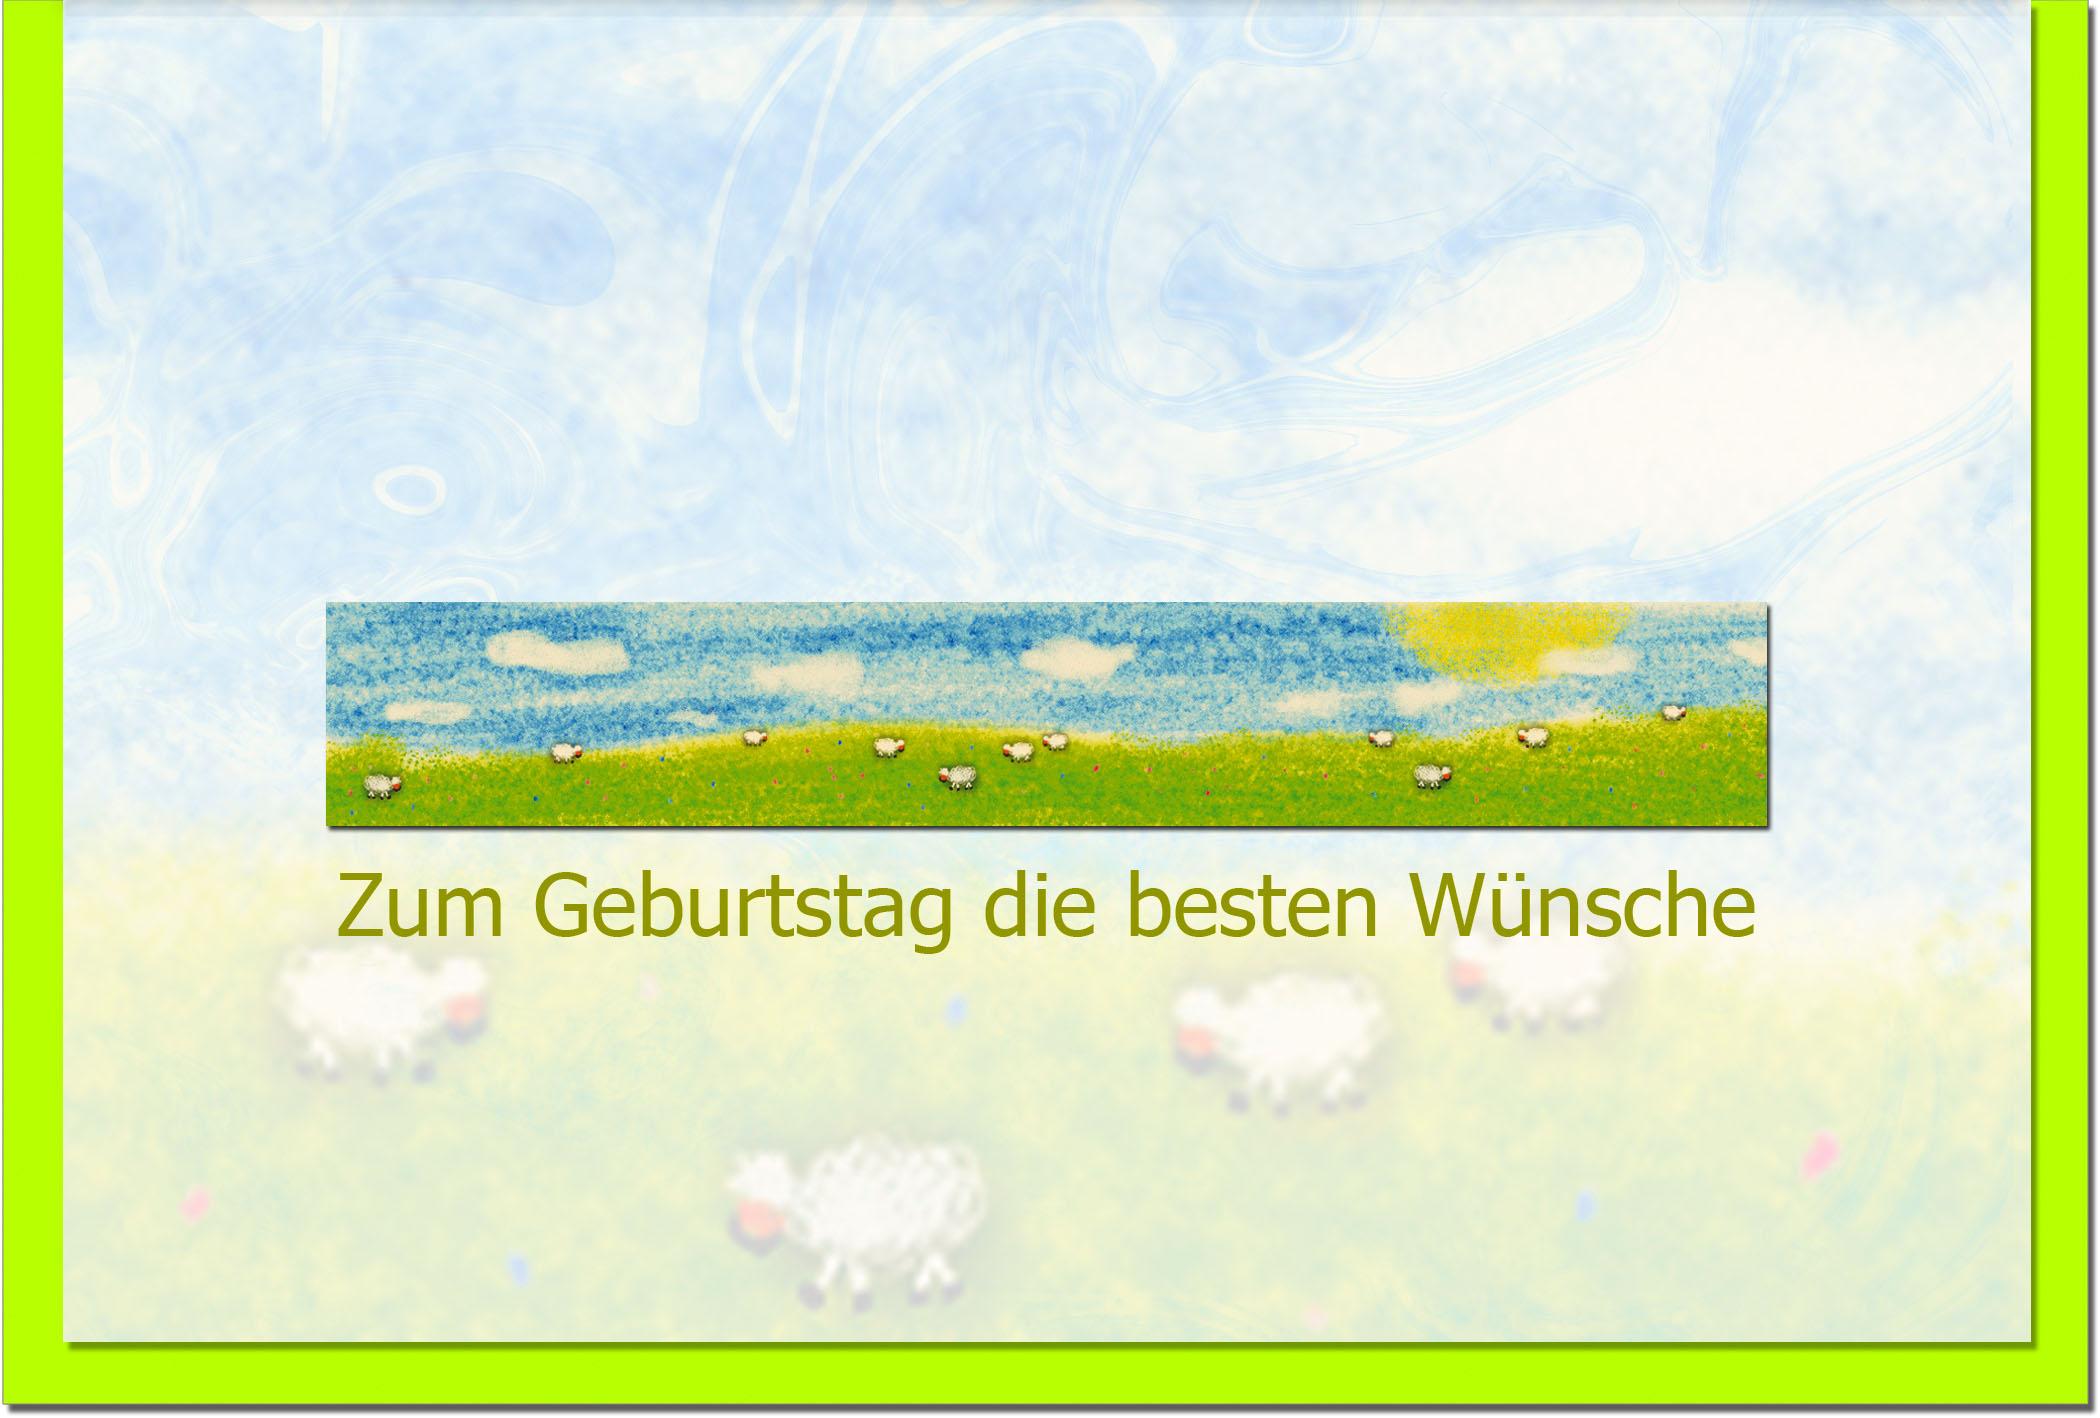 Geburtstagskarten / Grußkarten /Geburtstag Schafe